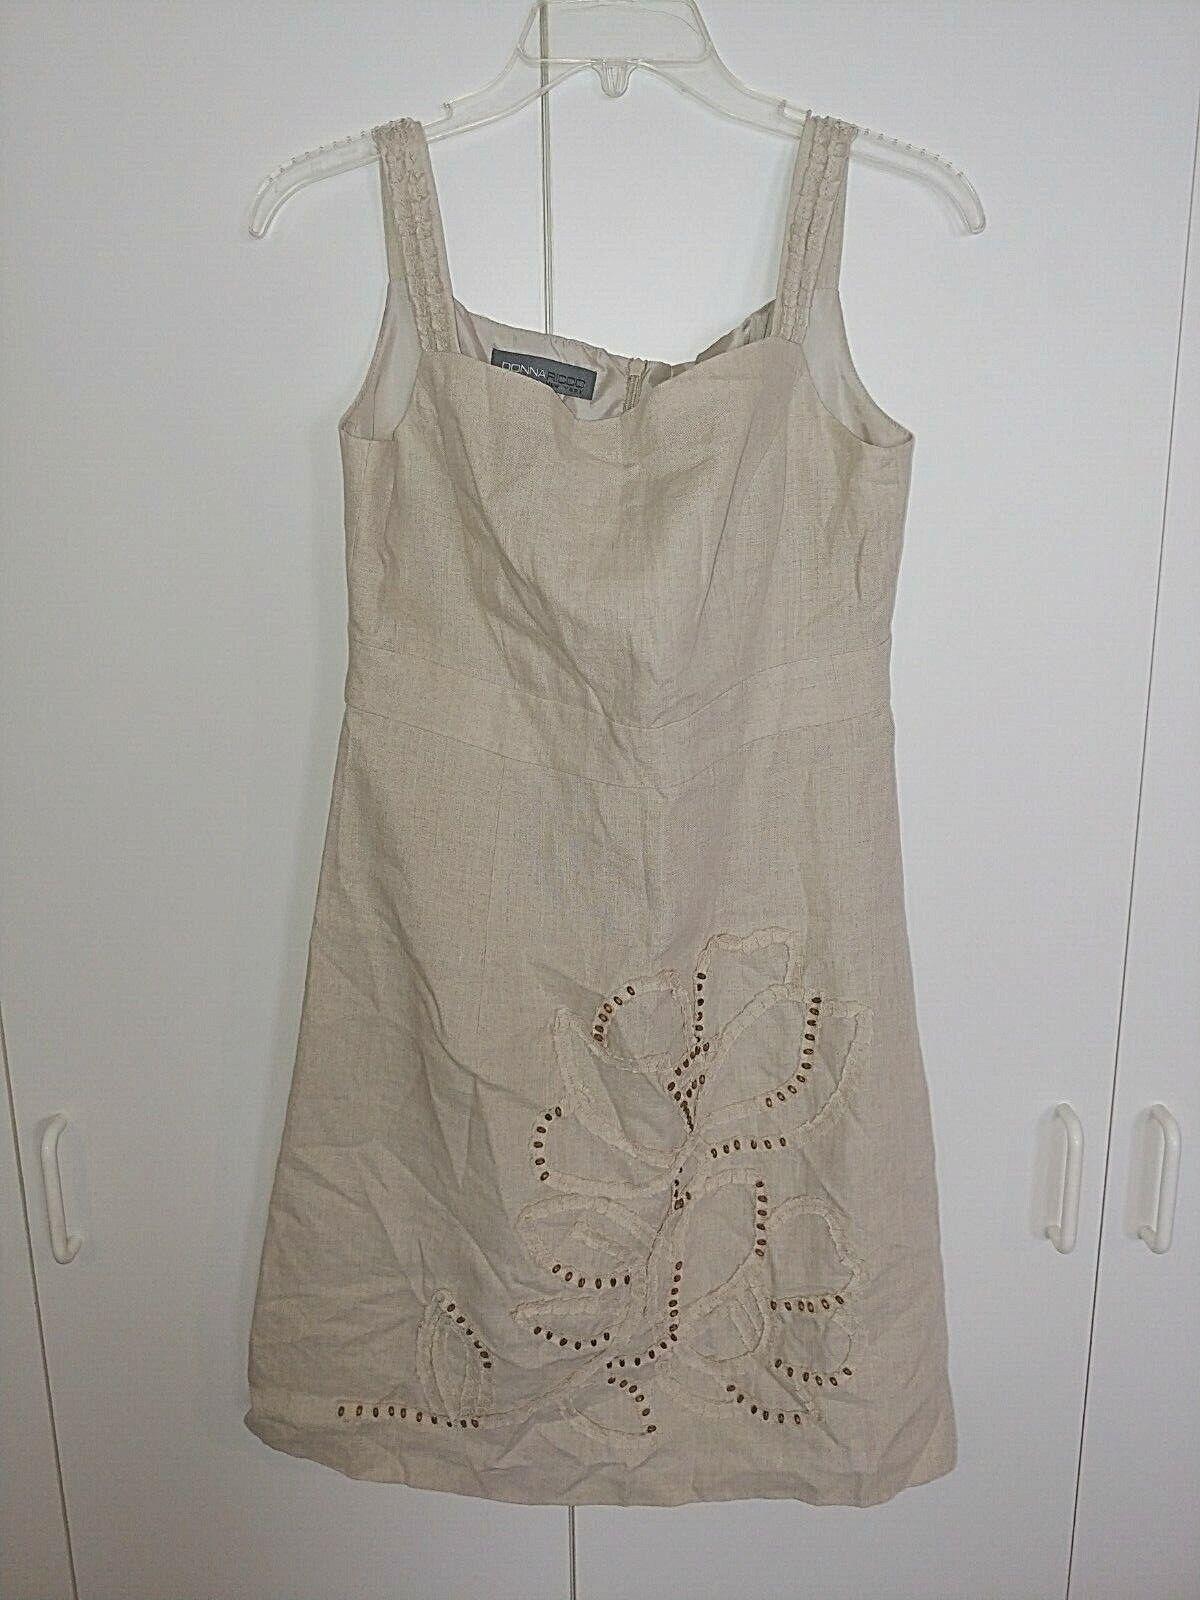 DONNA RICCO NEW YORK LADIES LINEN SLEEVELESS DRESS-6-TAN W/BEADED FRONT DESIGN